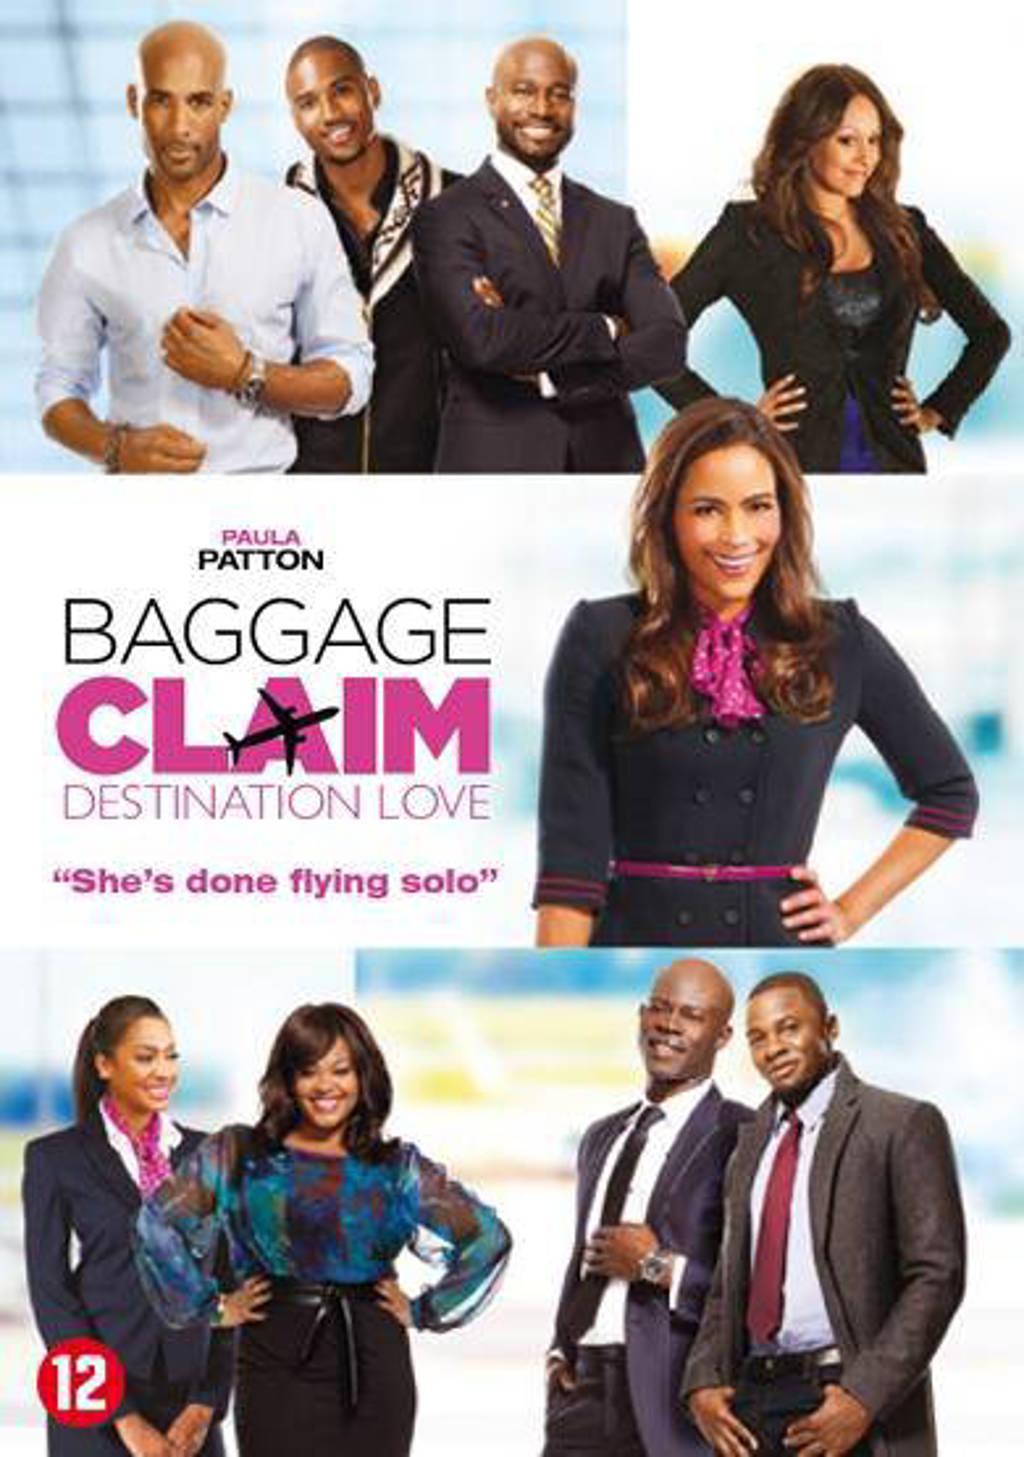 Baggage claim (DVD)